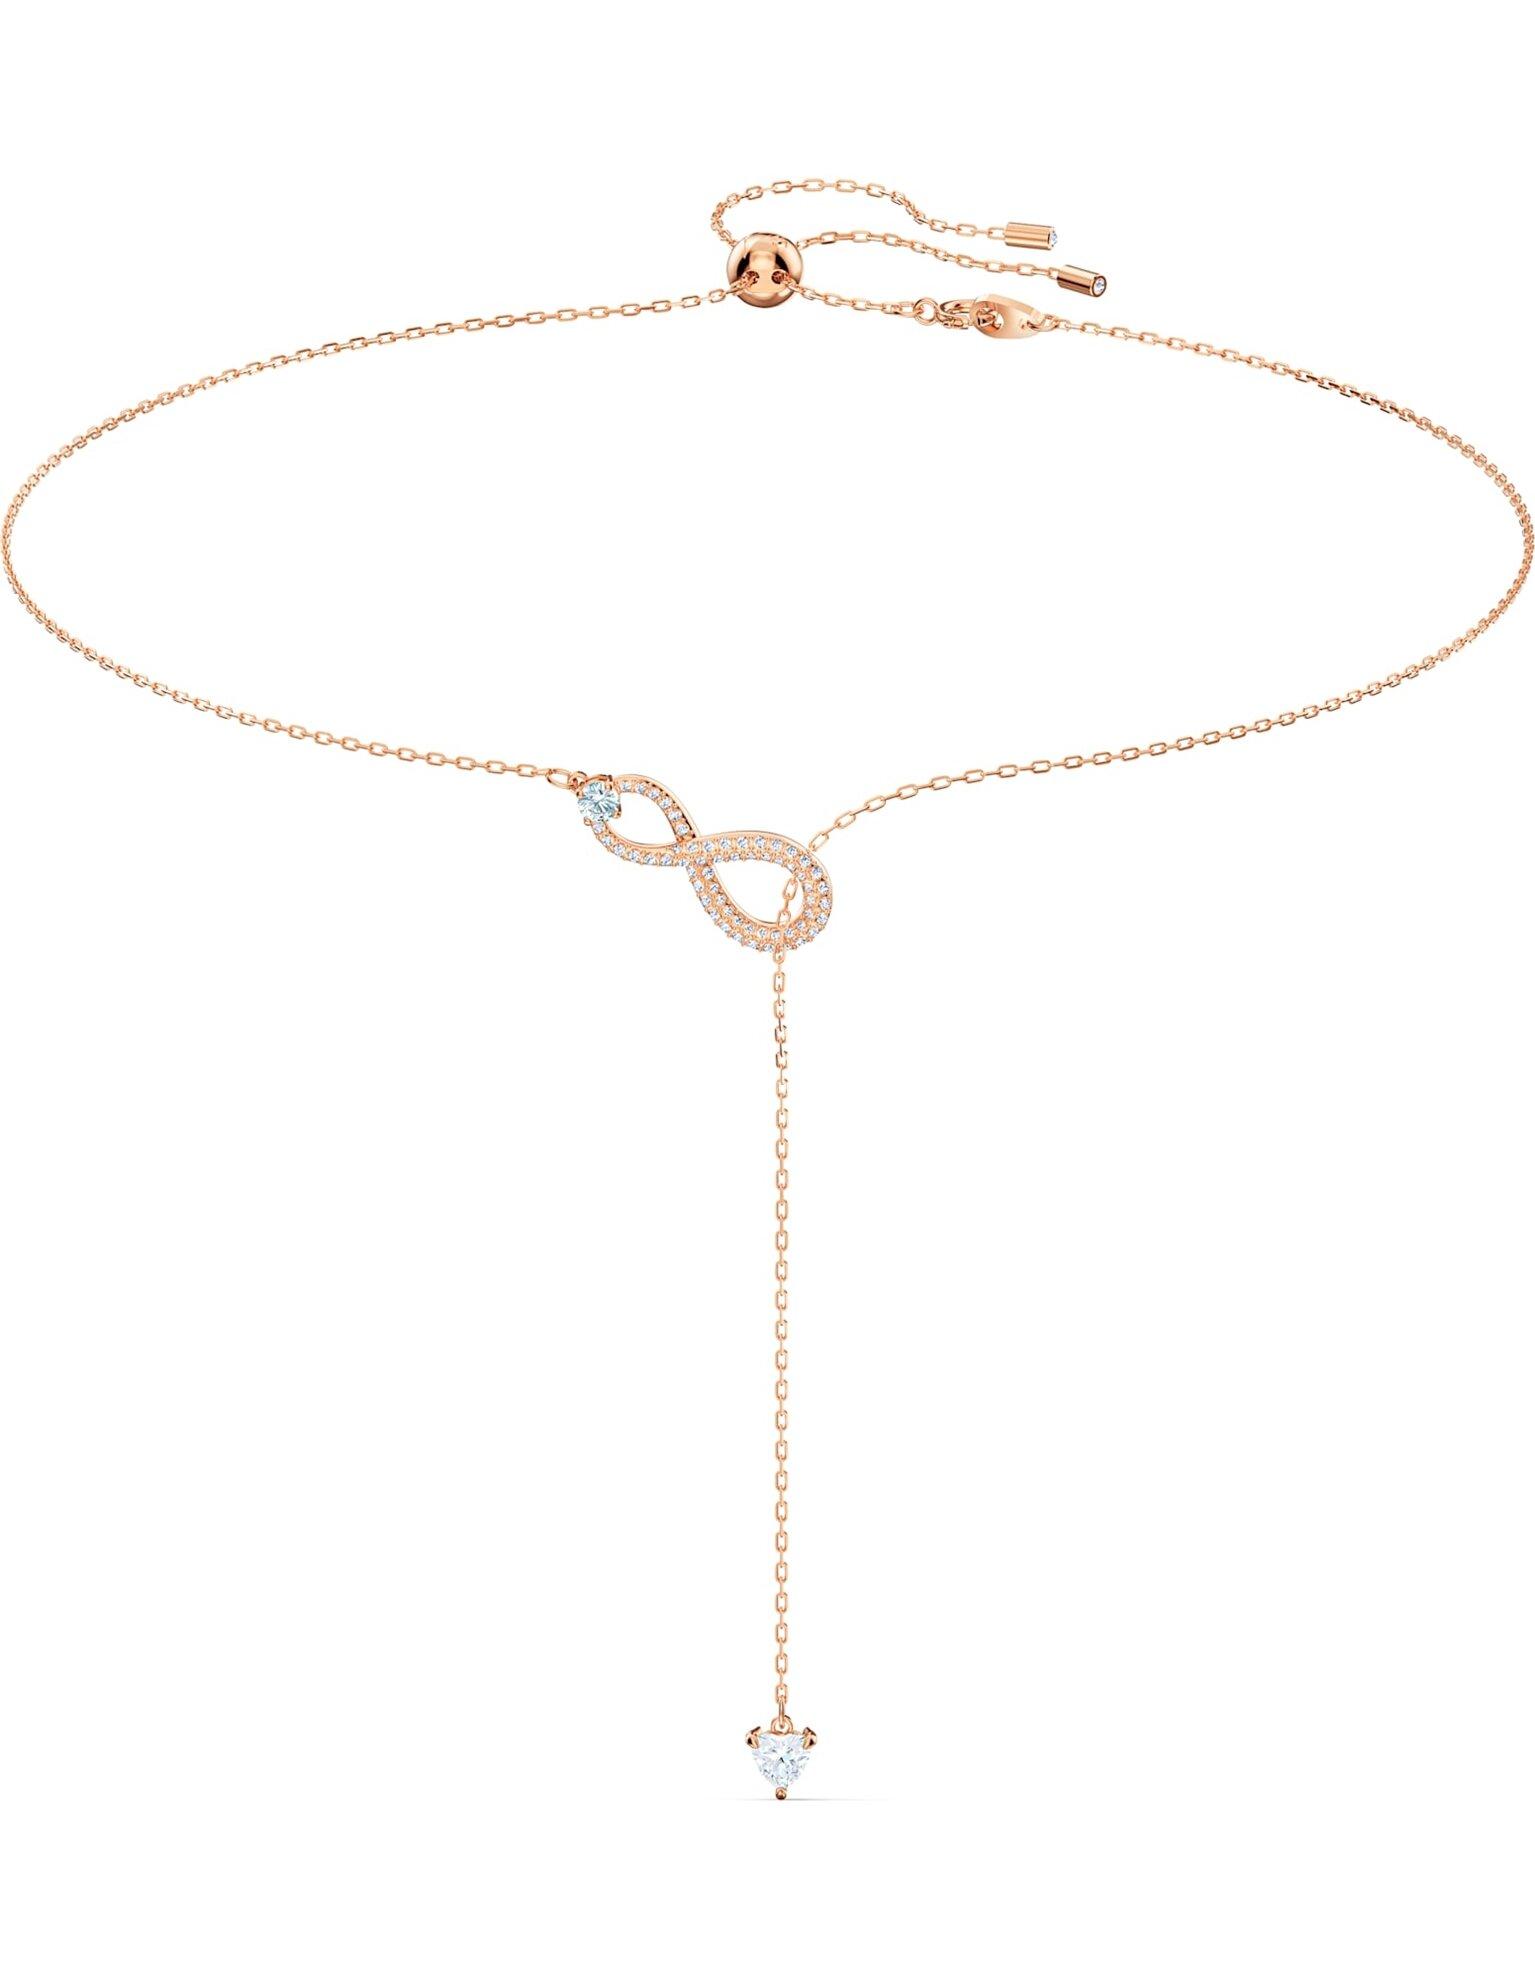 Picture of Swarovski Infinity Y-Kolye, Beyaz, Pembe altın rengi kaplama